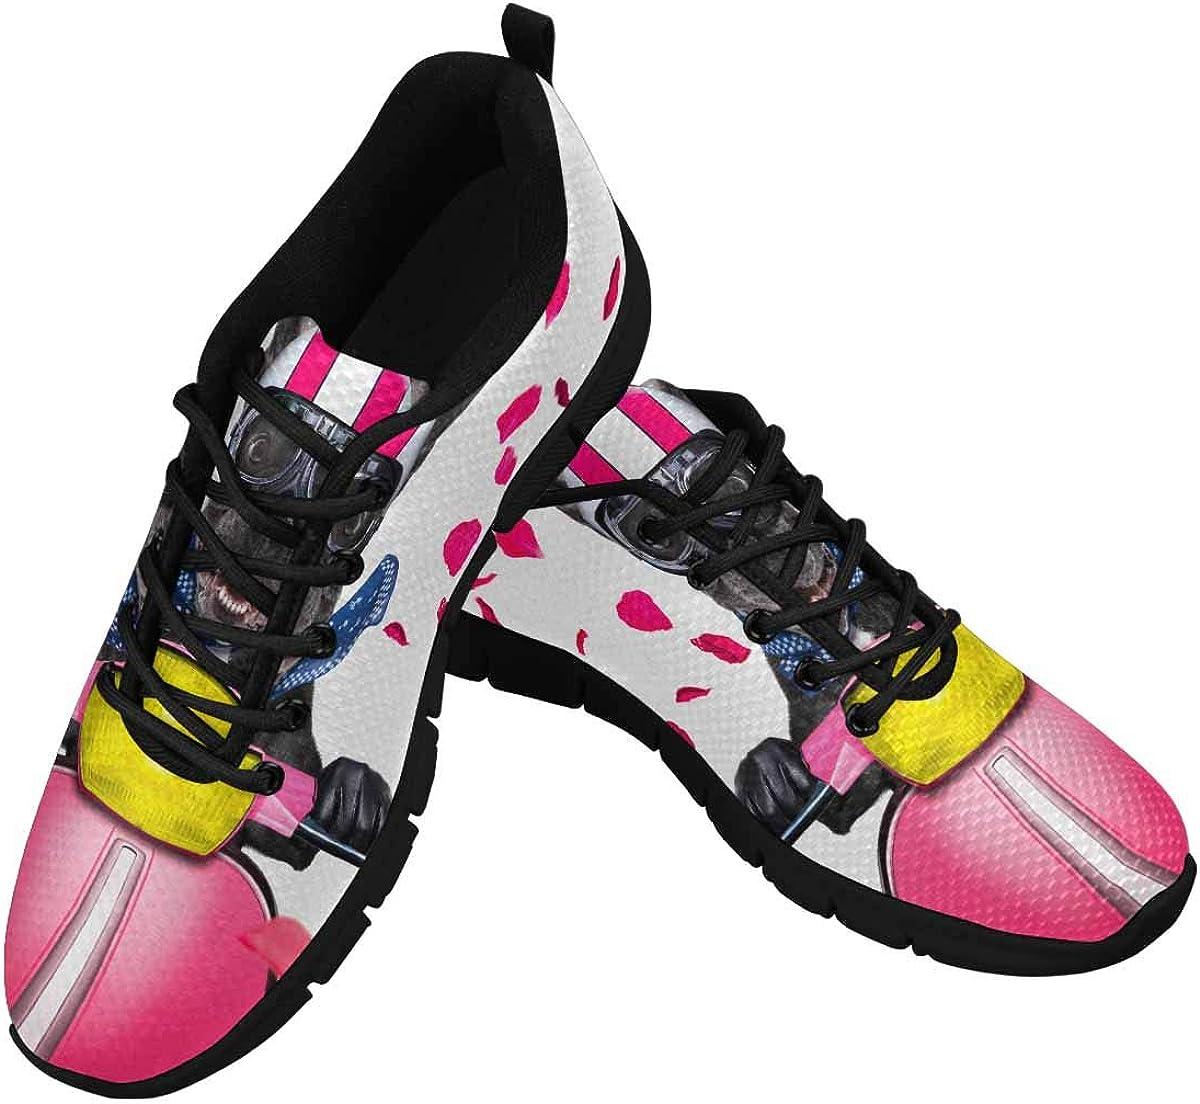 INTERESTPRINT French Bulldog Motorbike Women's Tennis Running Shoes Lightweight Sneakers